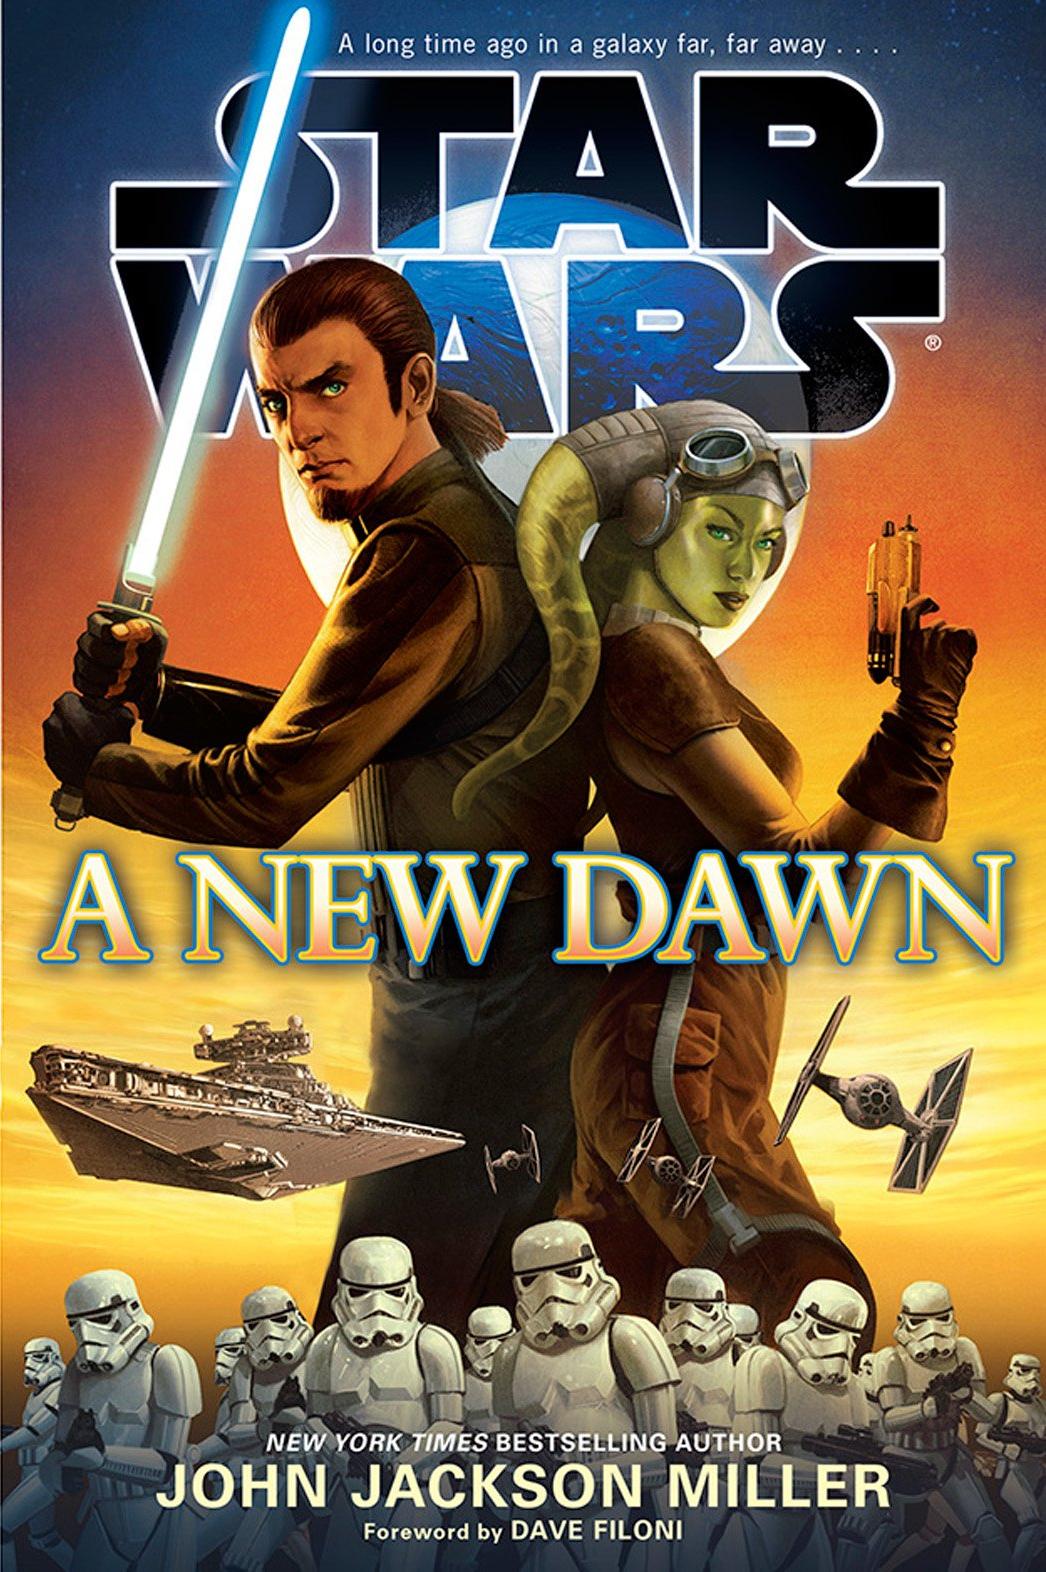 Star Wars - A New Dawn Cover